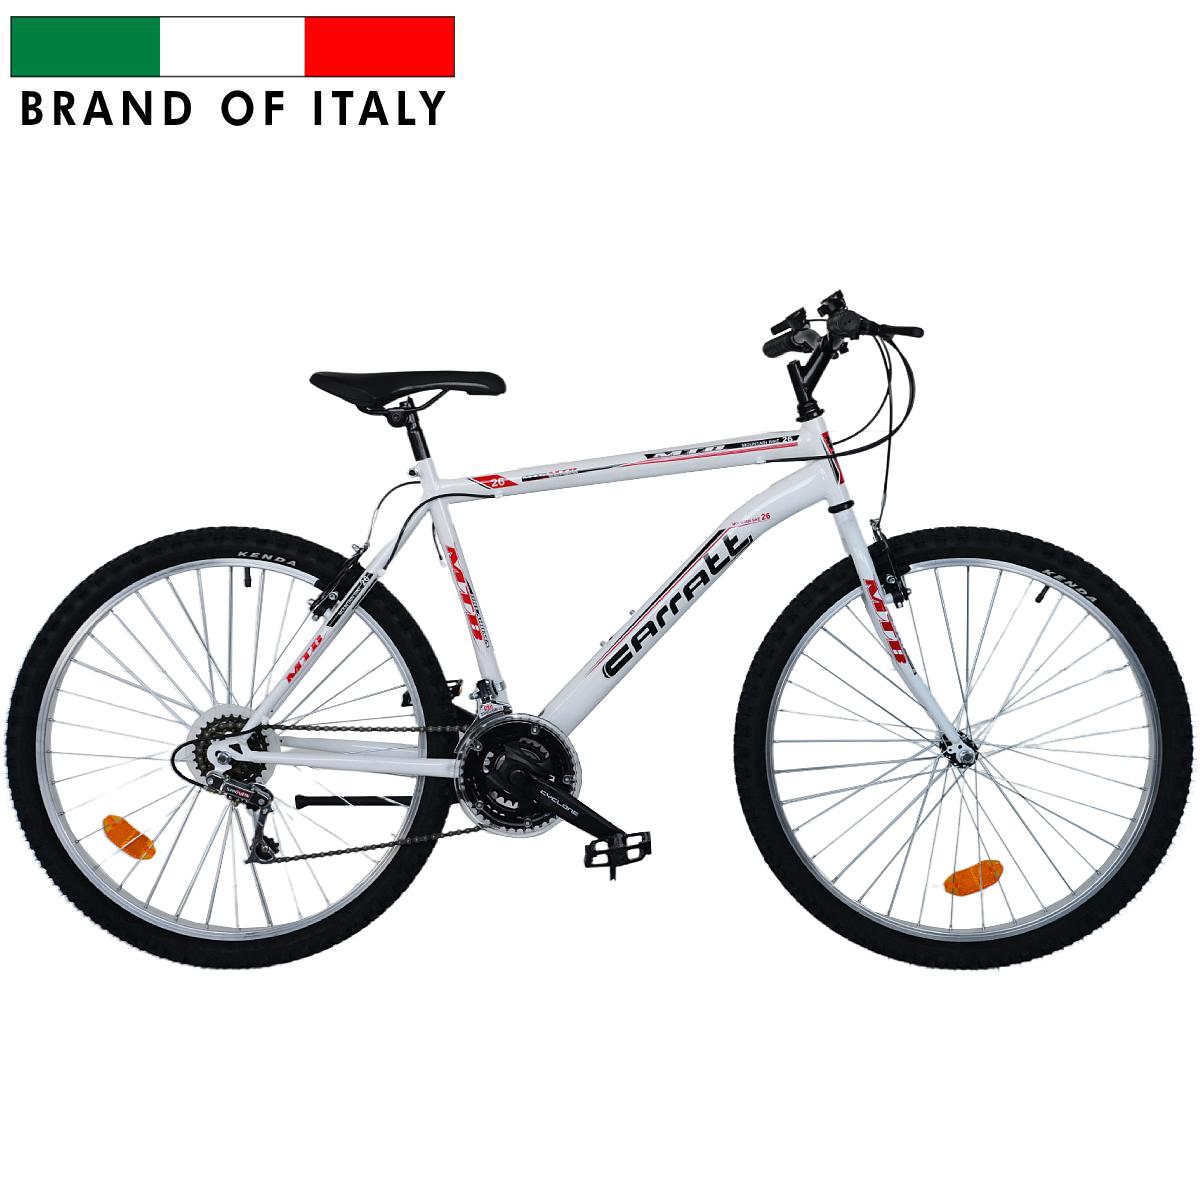 CARRATT 8300 26 18V FRIZIONE WHITE 208300U3 Pilsētas velosipēds